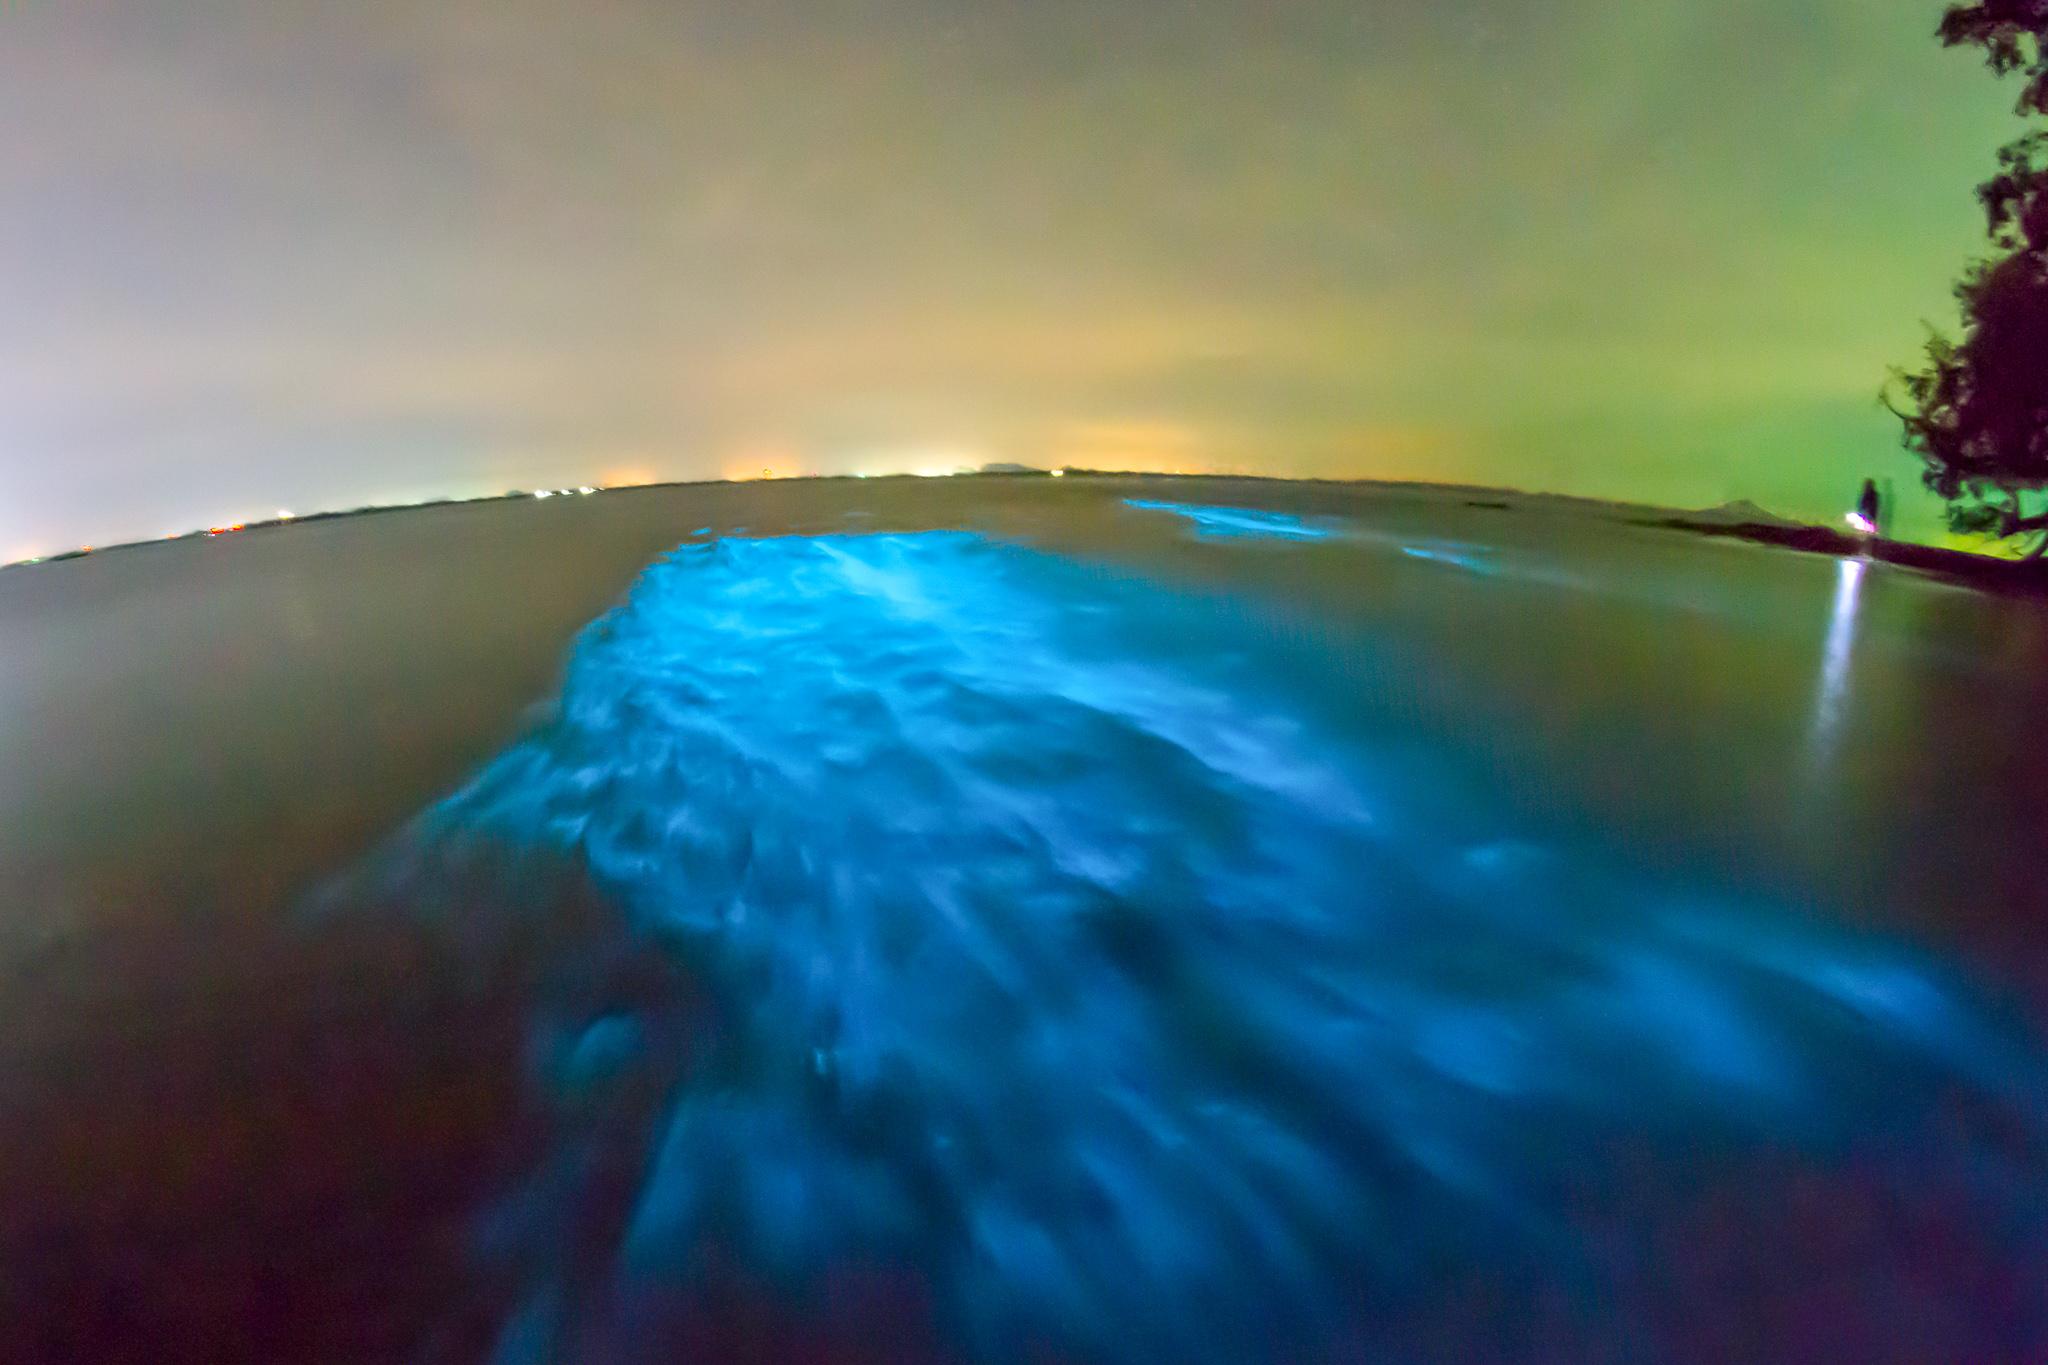 An example of bioluminescence